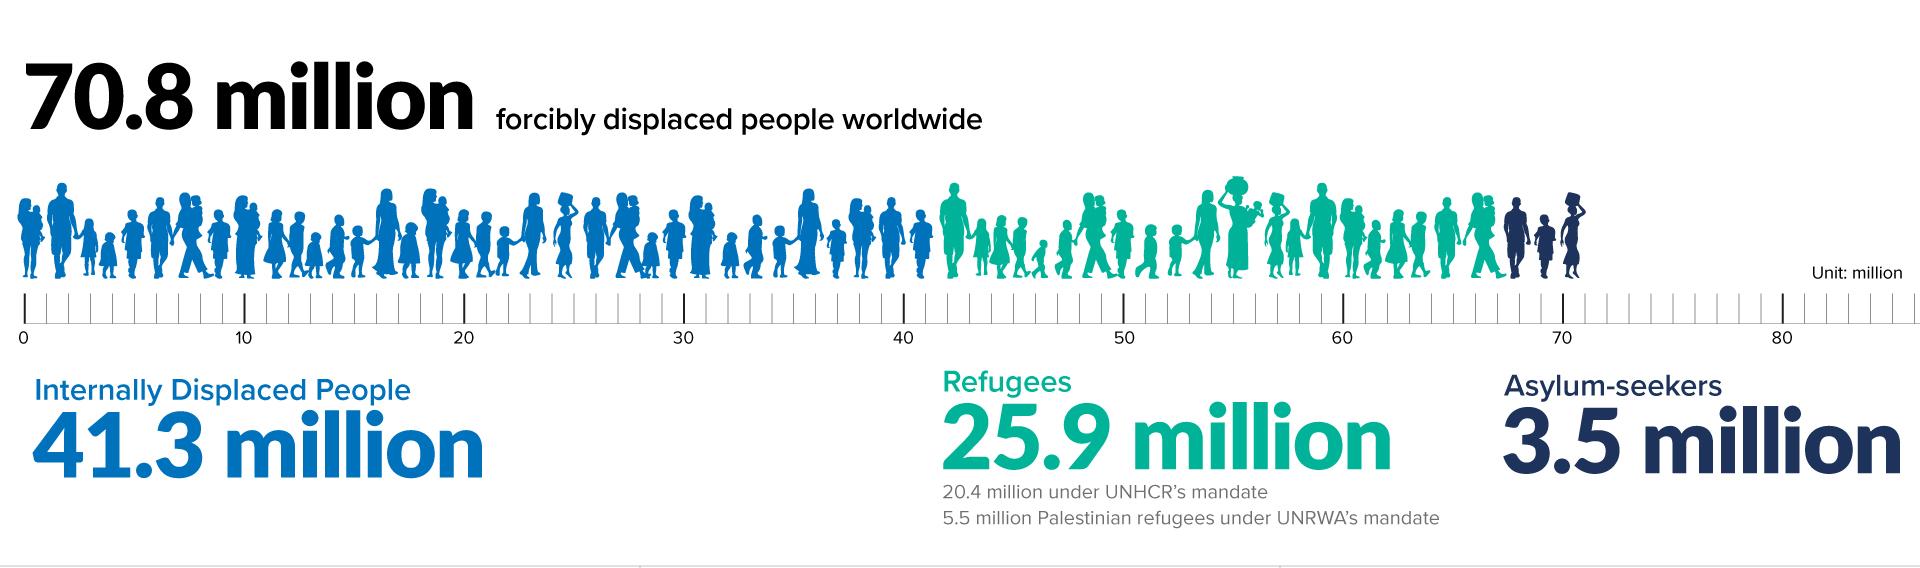 displaced people worldwide